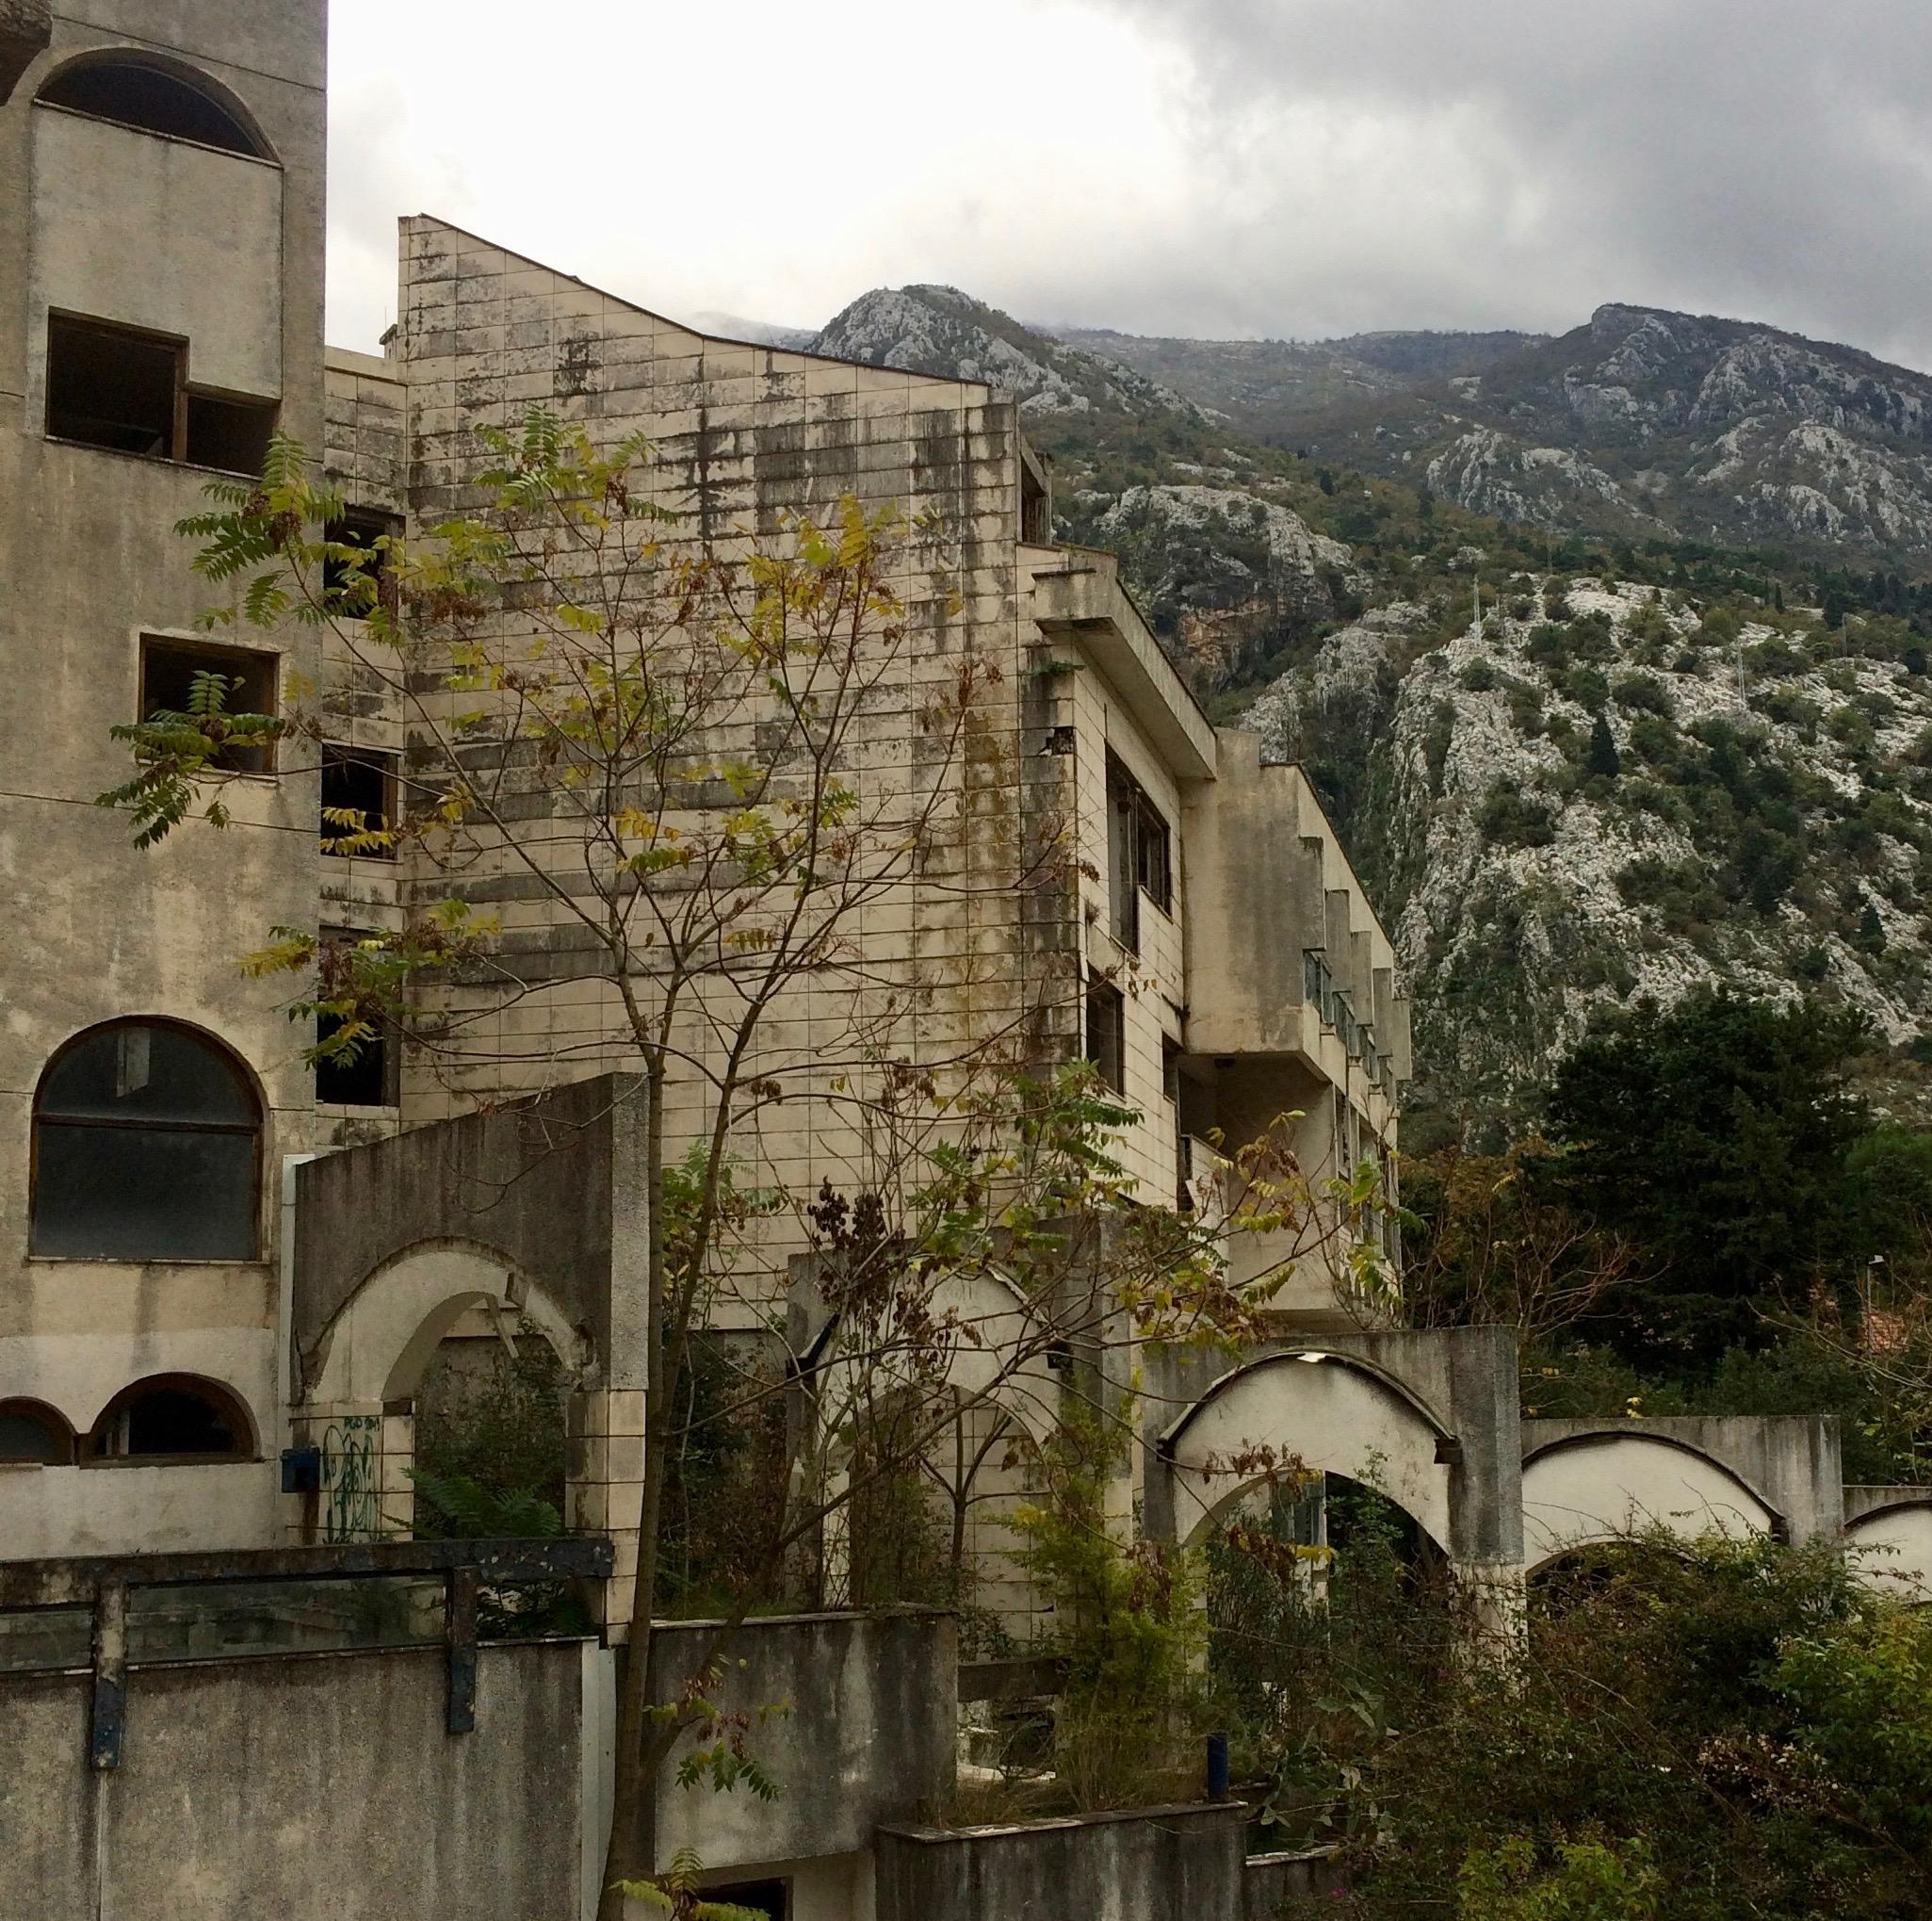 Hotel Fjord, 1986 Kotor, Montenegro. Designed by Zlatko Uglien.